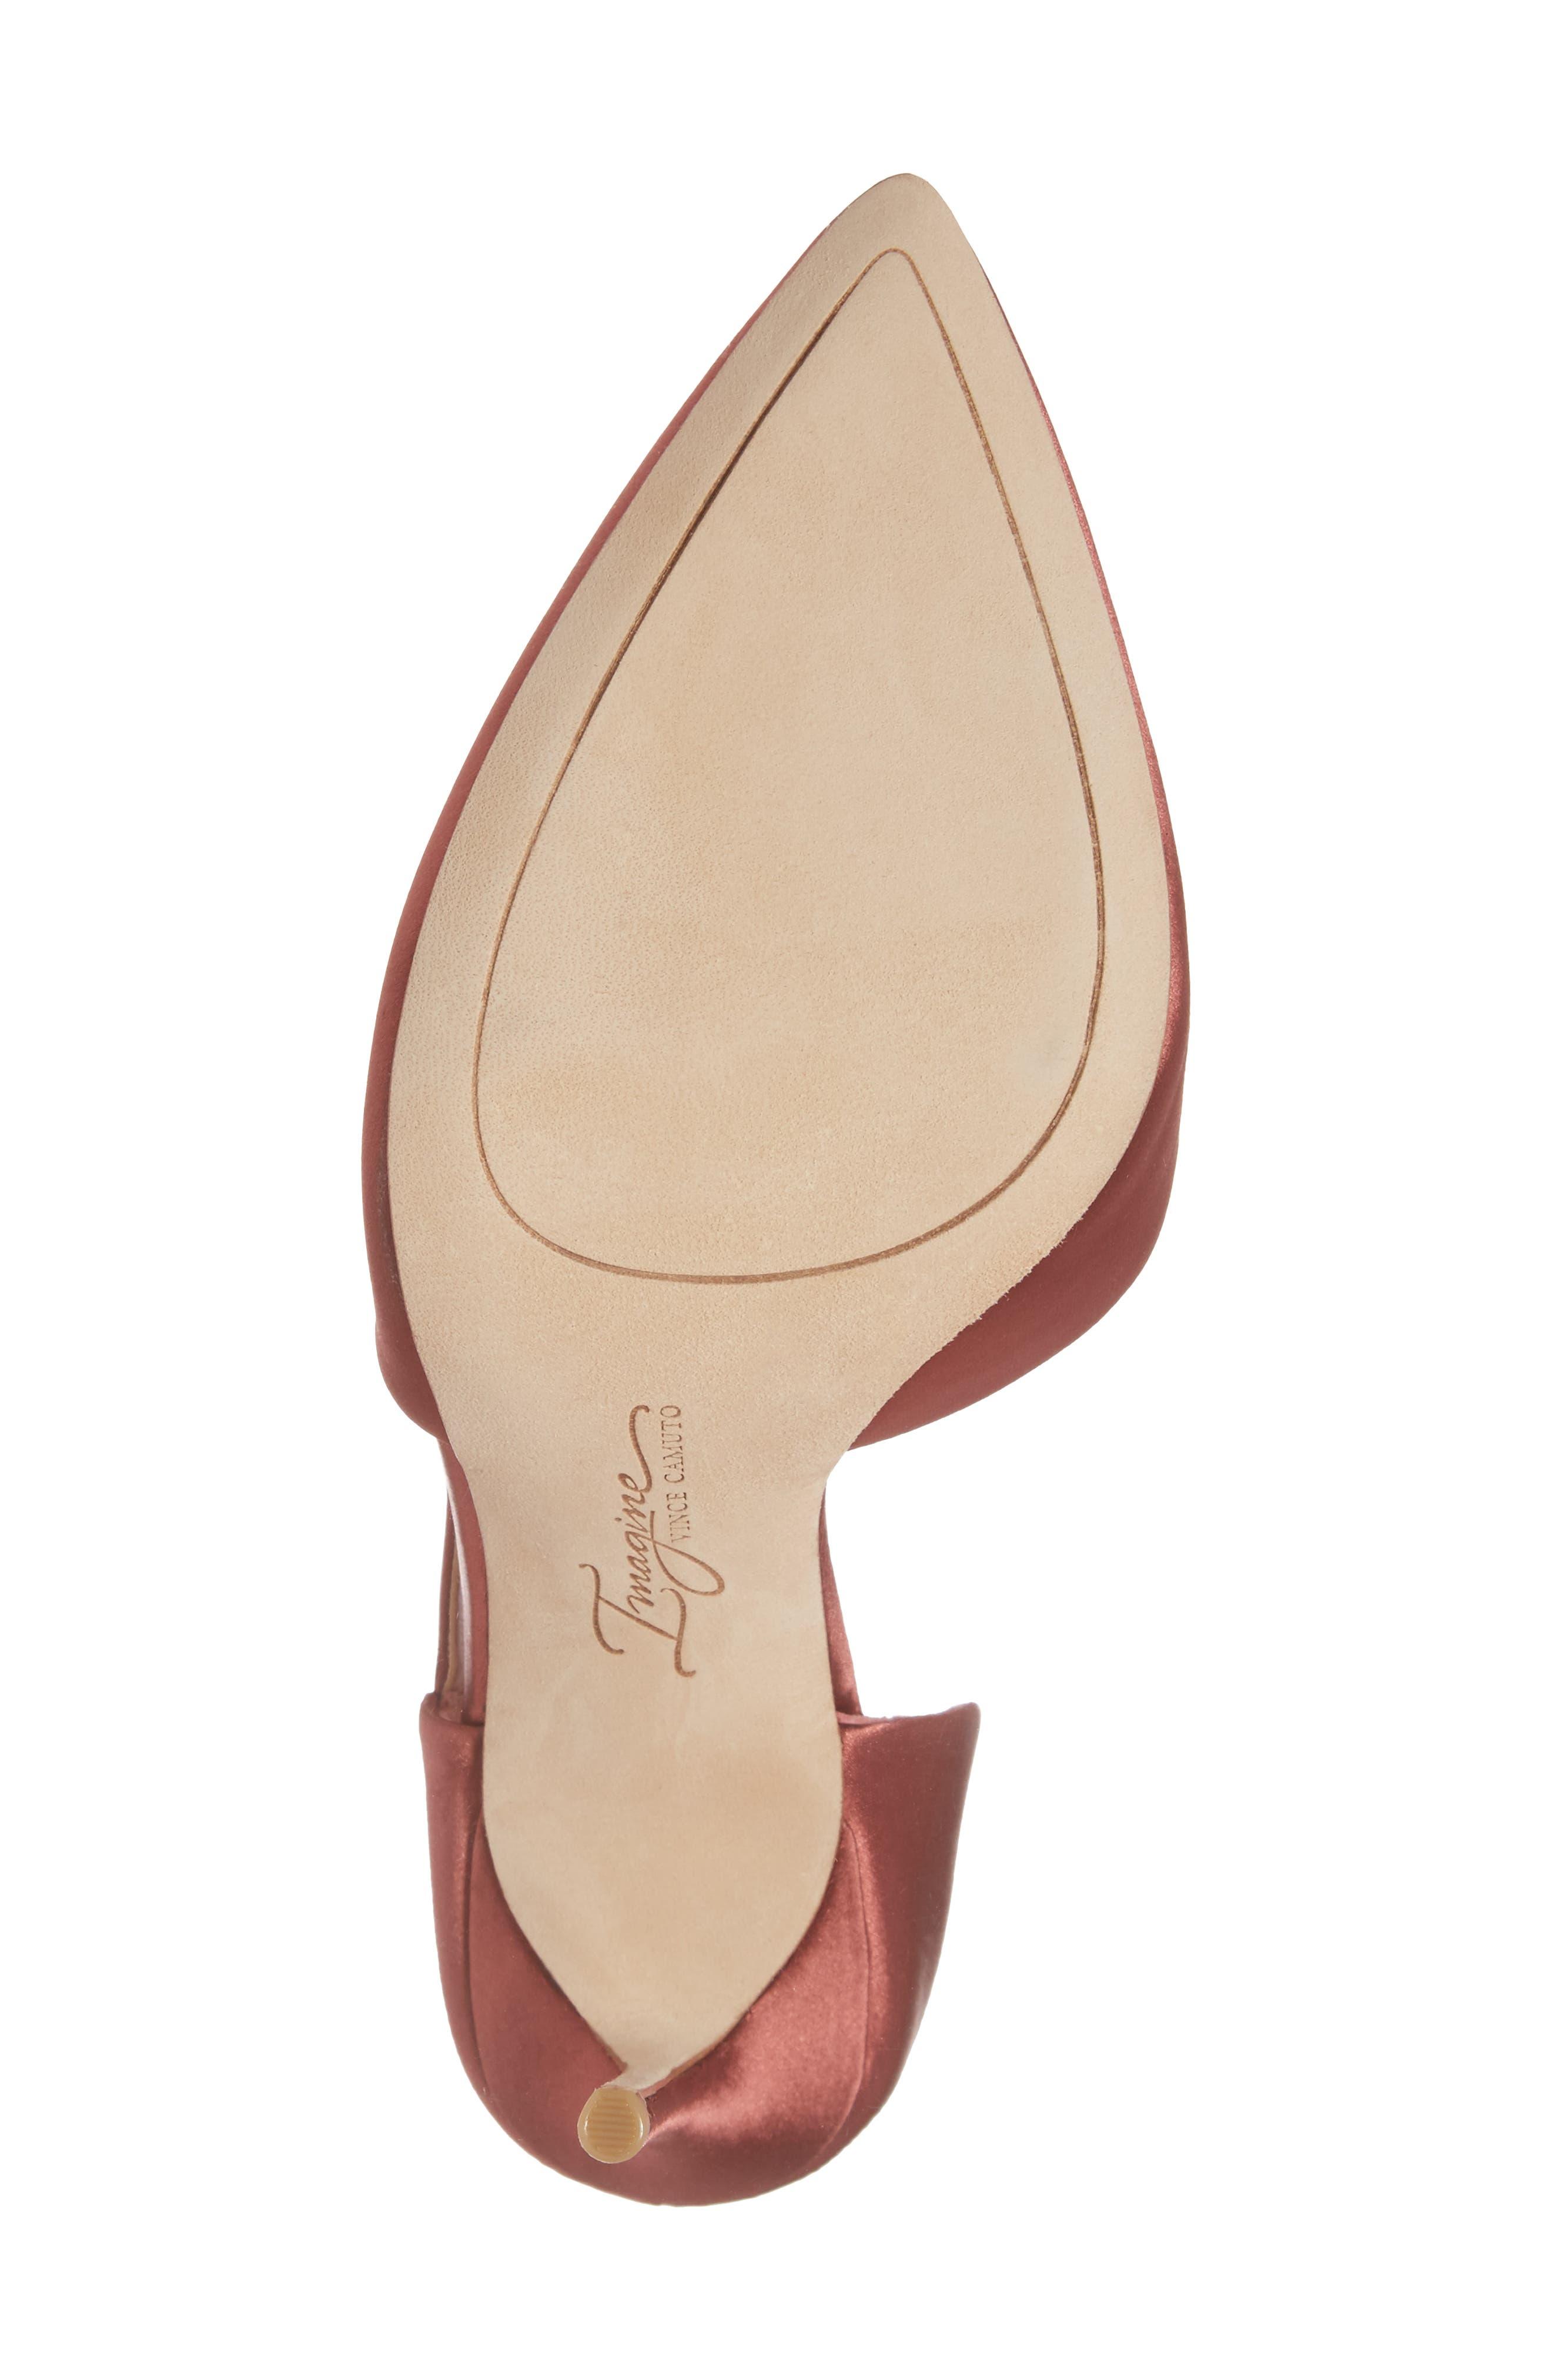 Oya Asymmetrical Pointy Toe Pump,                             Alternate thumbnail 72, color,